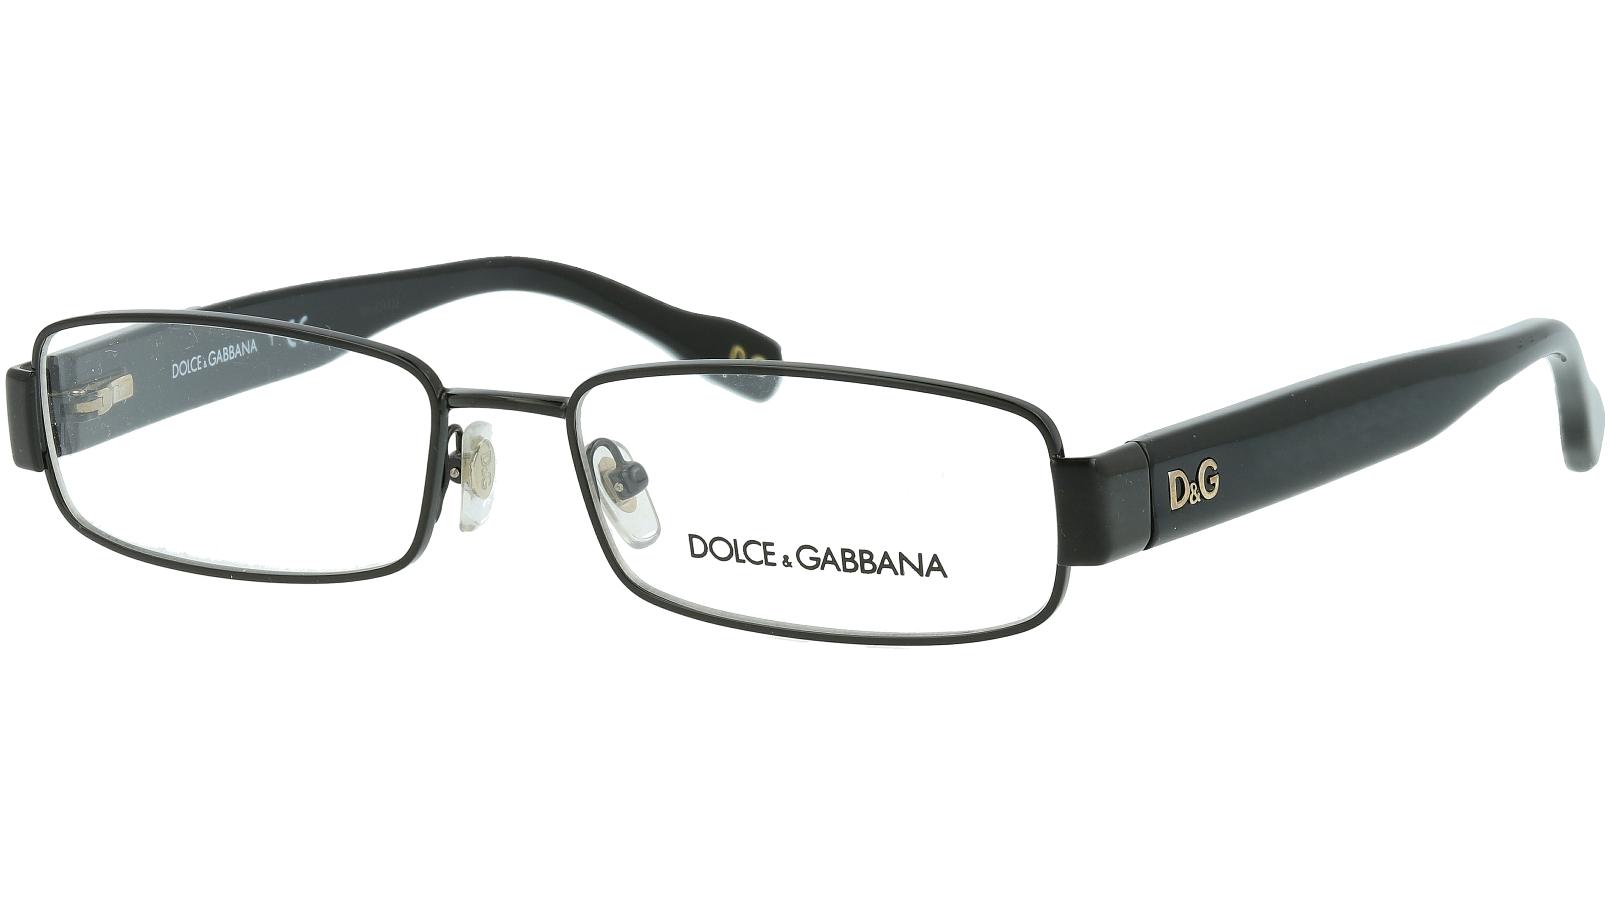 Dolce&Gabbana DD5091 064 53 BLACK Glasses